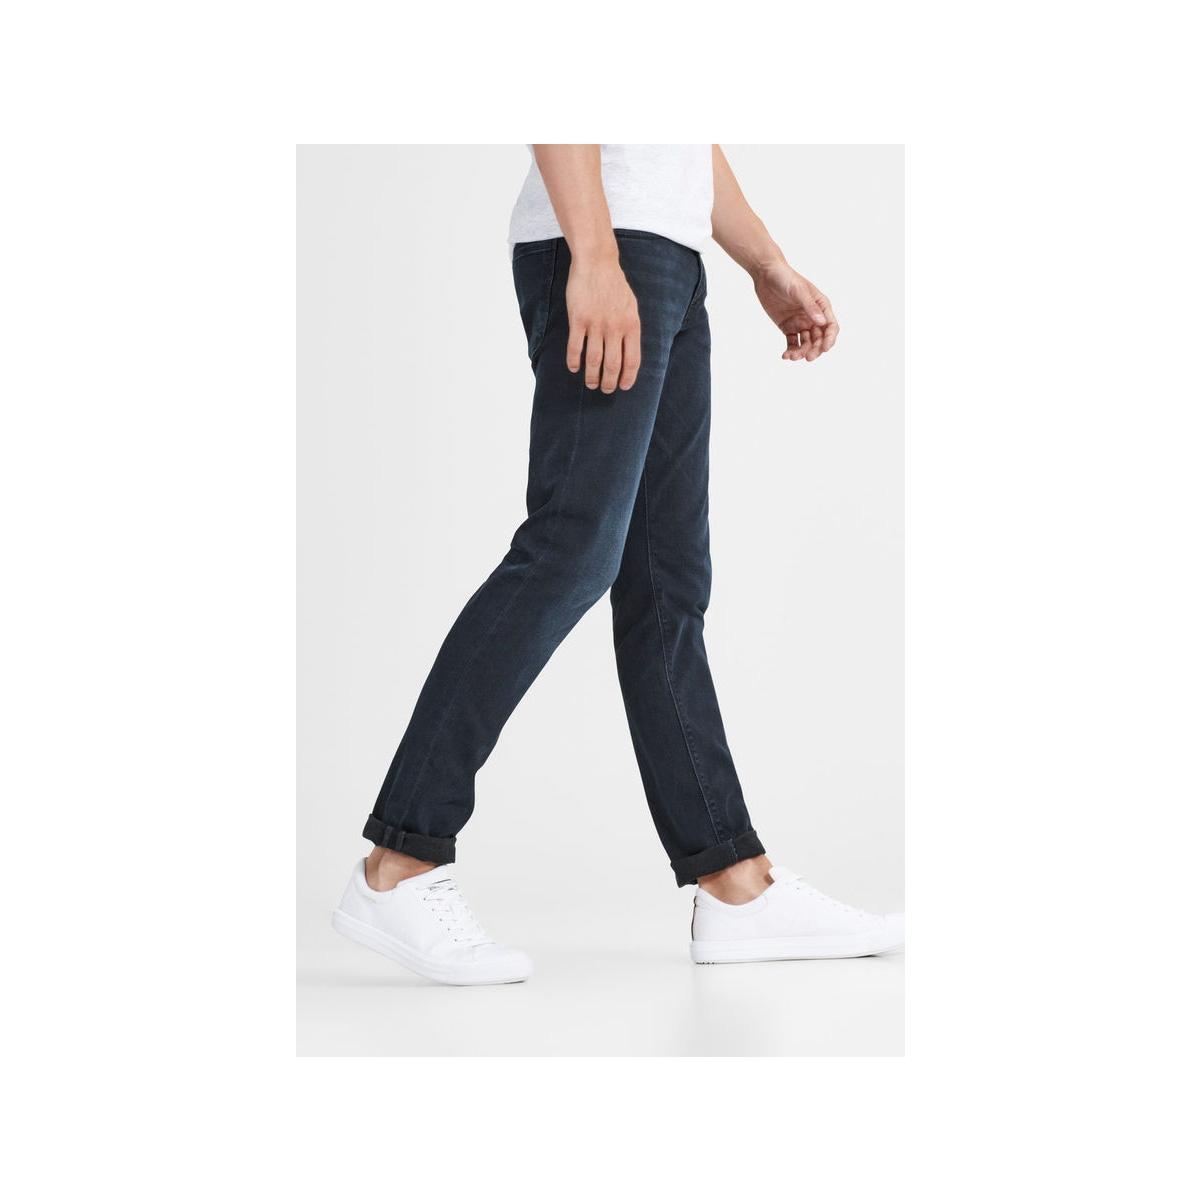 jjiglenn jjfelix am 458 pcw sps noos 12125513 jack & jones jeans black denim